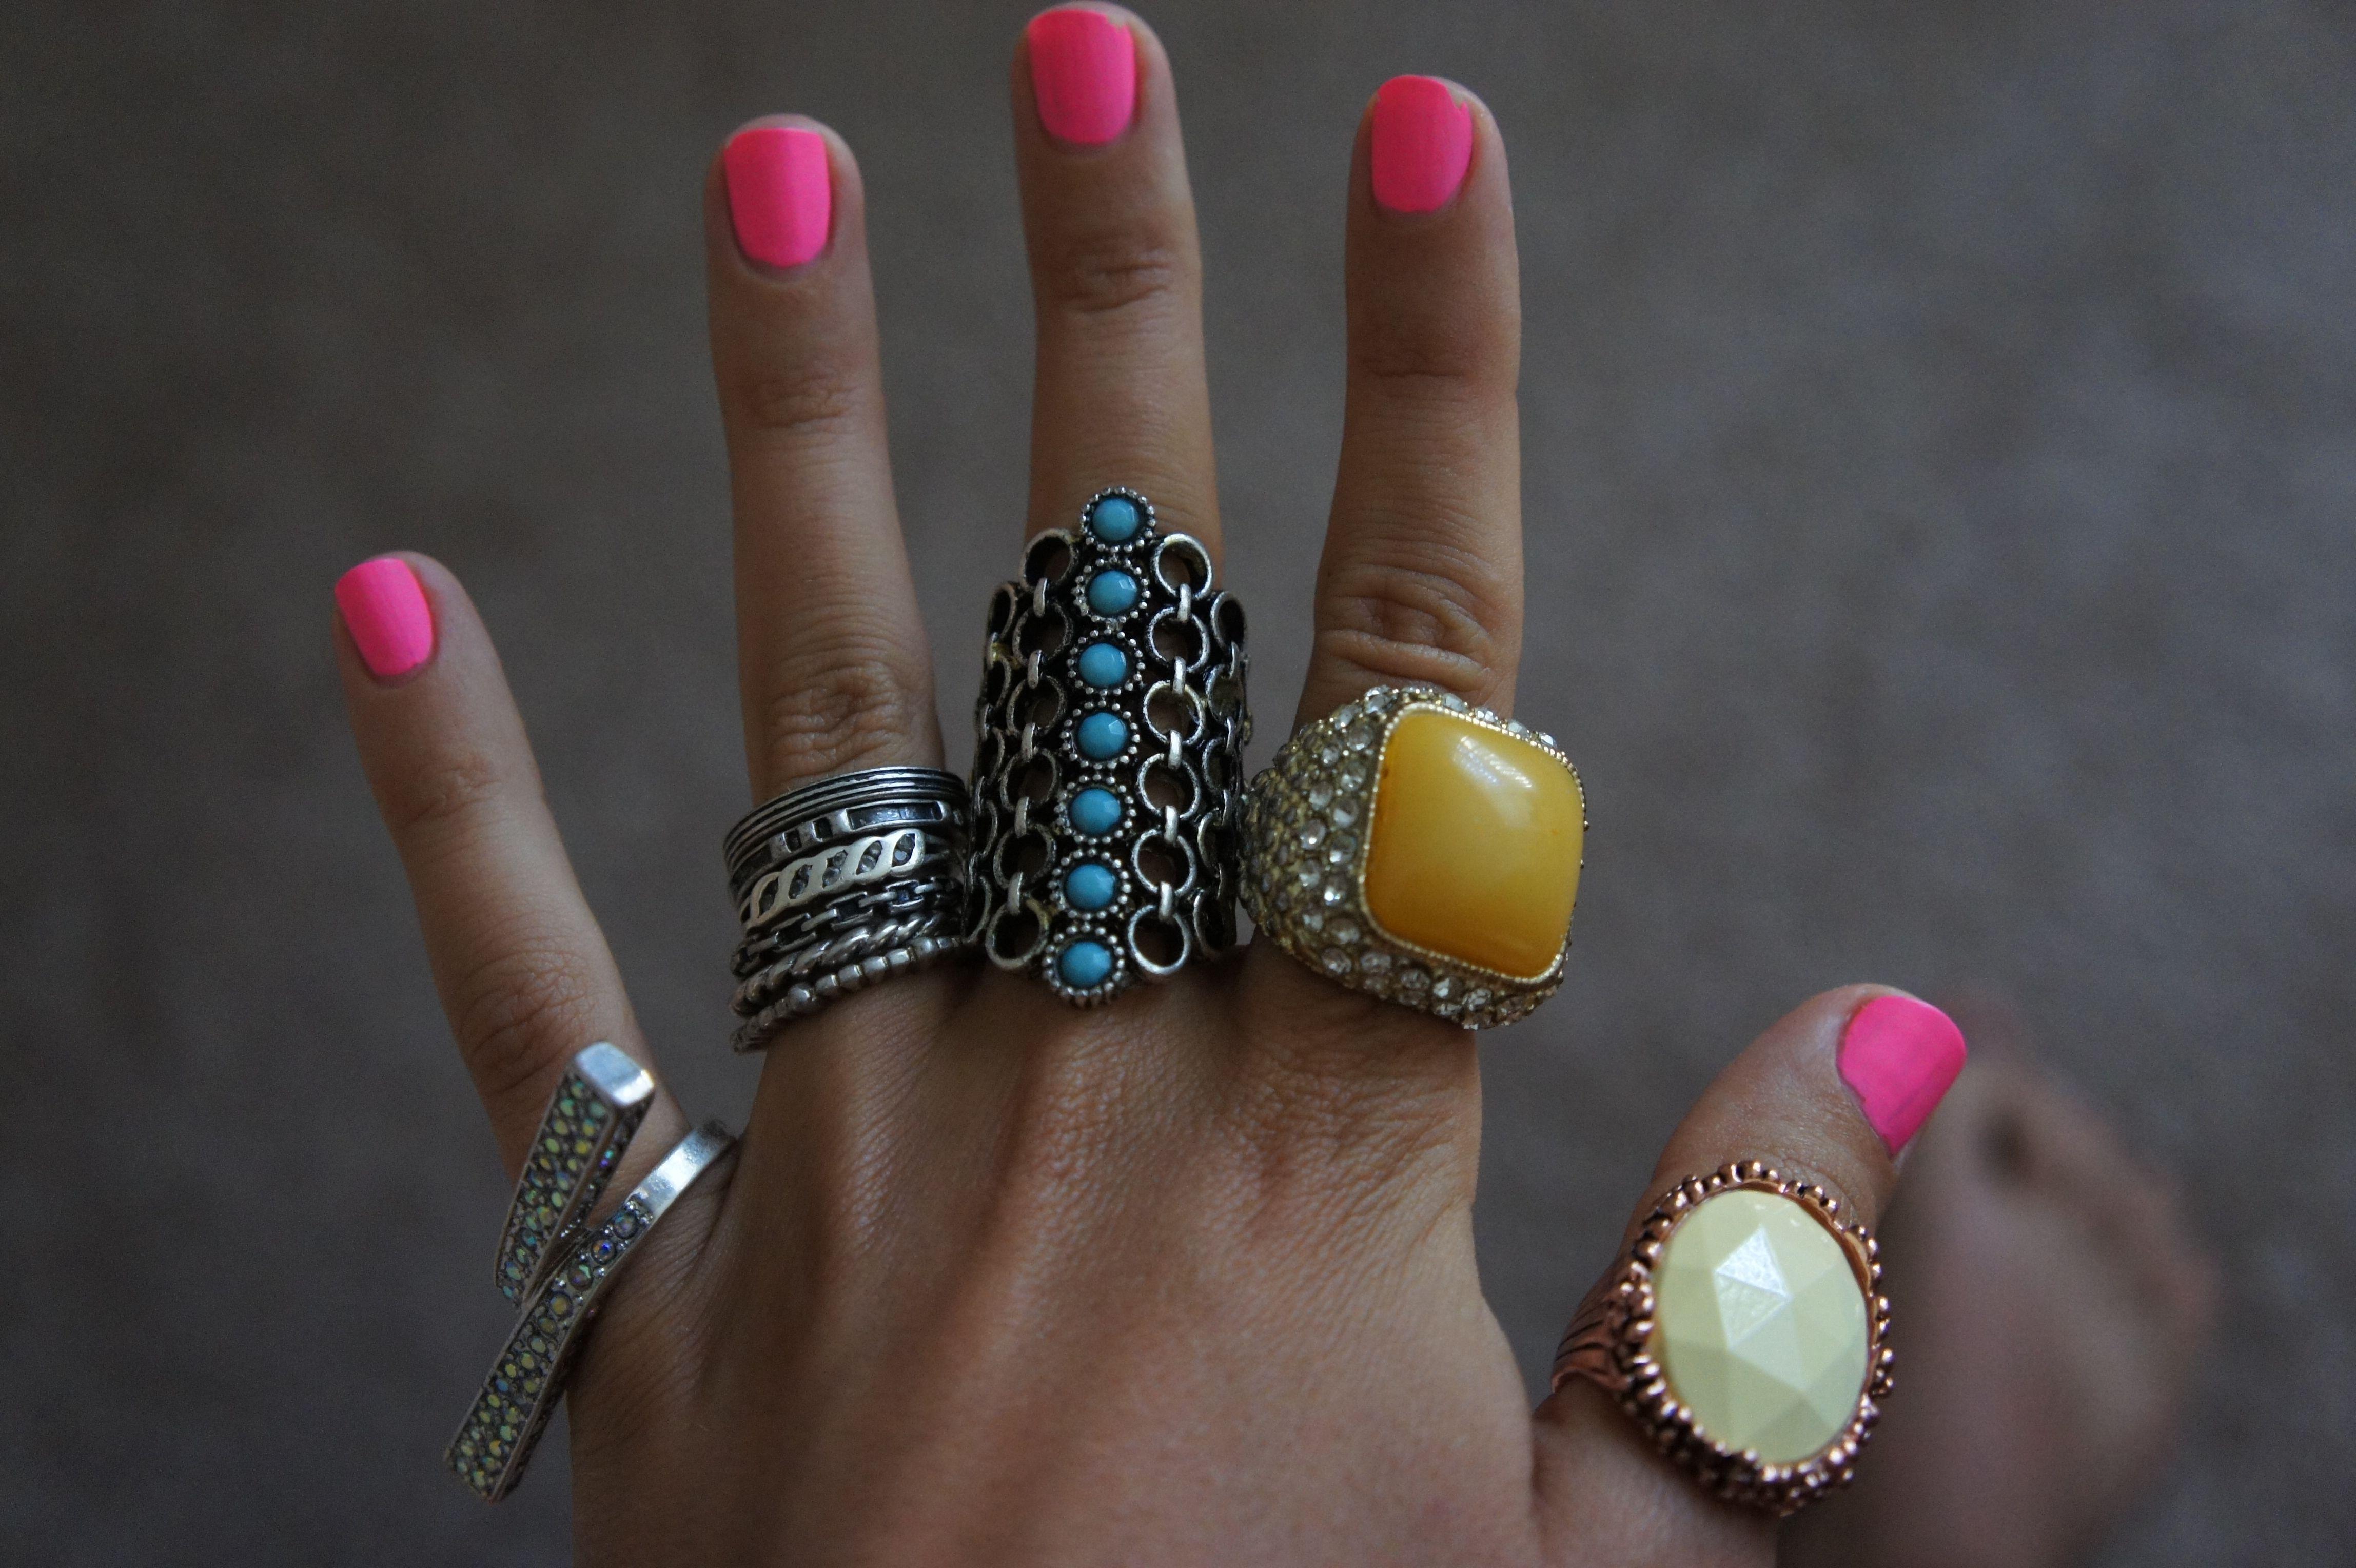 Matte pink nails nails pinterest matte pink nails pink nails